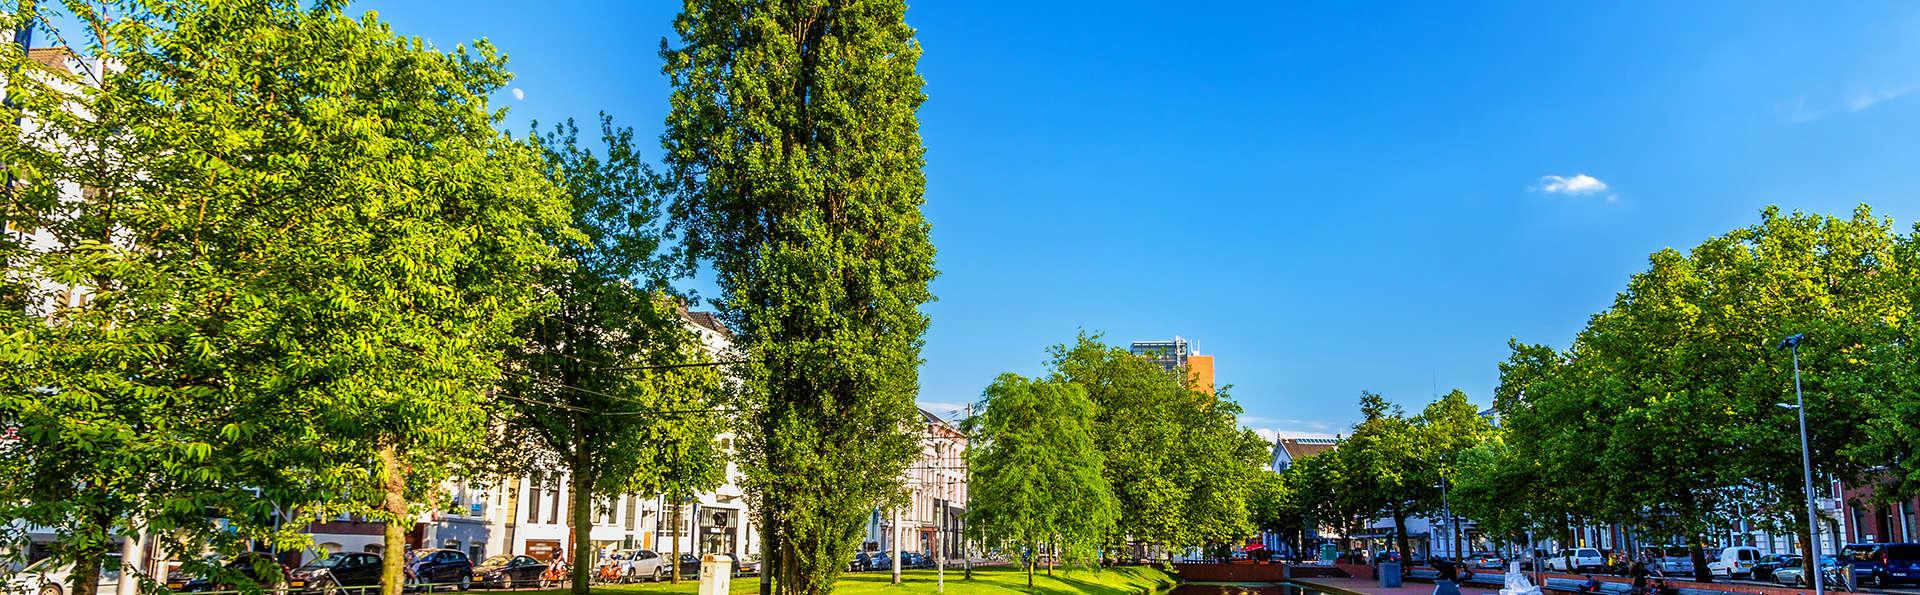 Stadsvilla Mout - Edit_Rotterdam2.jpg